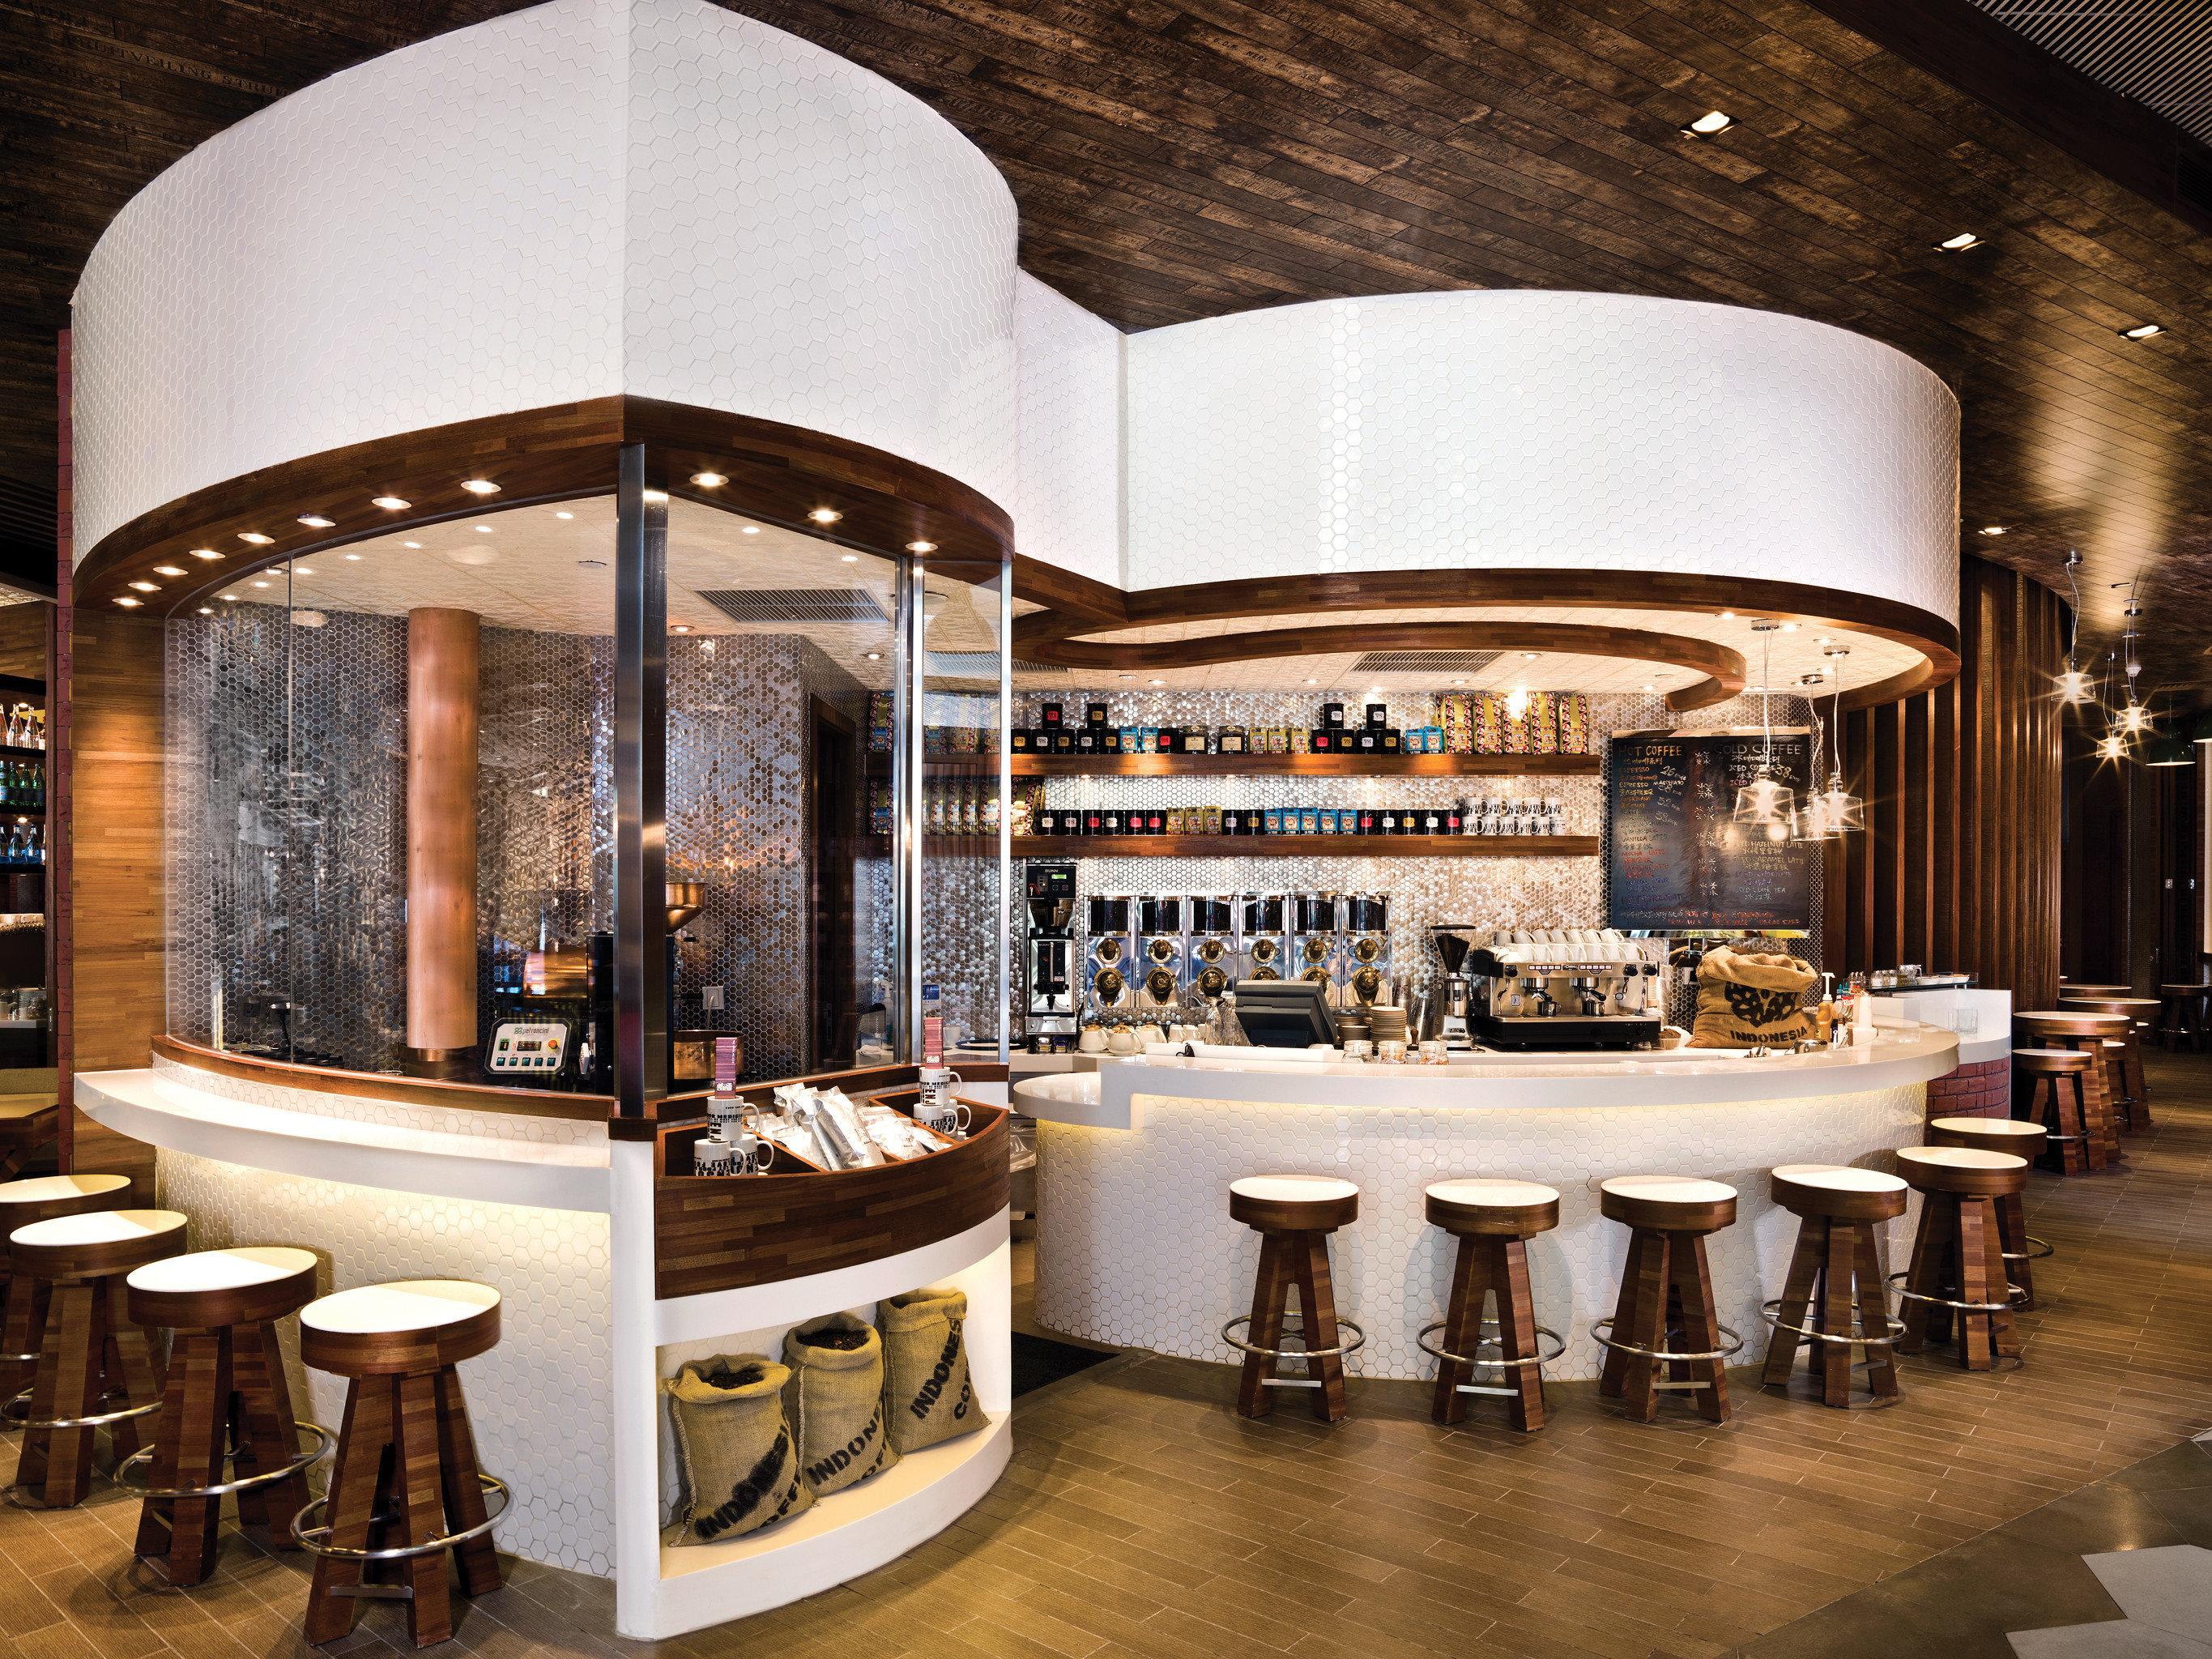 Bar Dining Drink Eat Hip Luxury restaurant Lobby lighting cabinetry